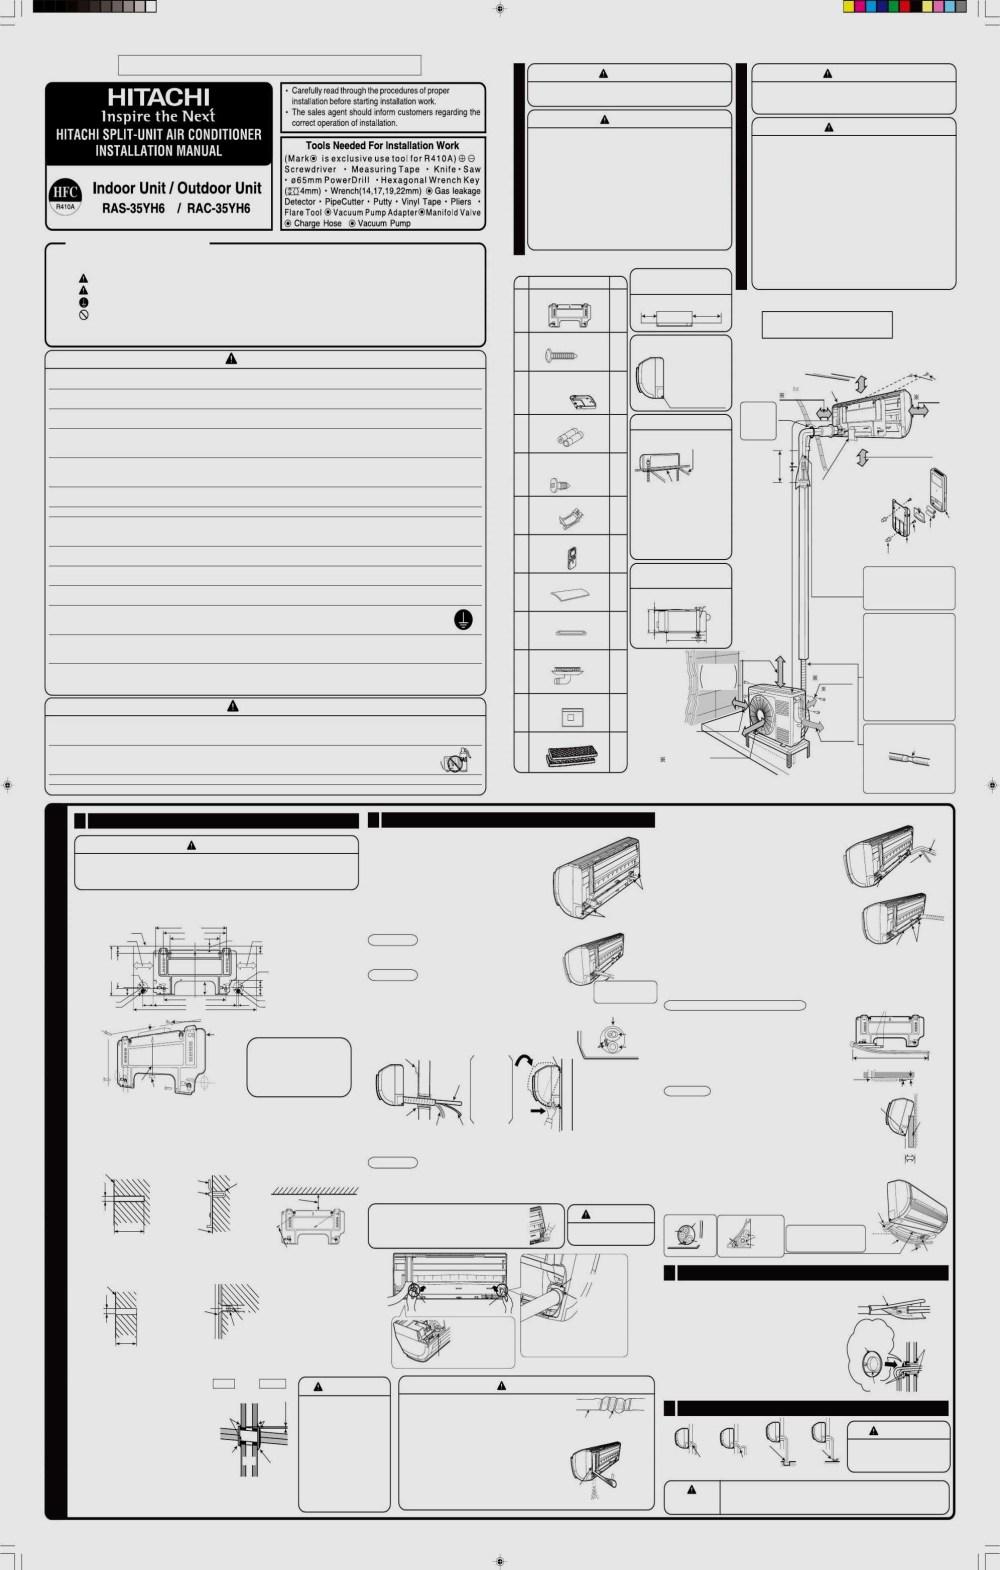 medium resolution of kicker cvr 12 wiring diagram likewise wiring sub pro39s and the like kicker cvr 12 wiring diagram